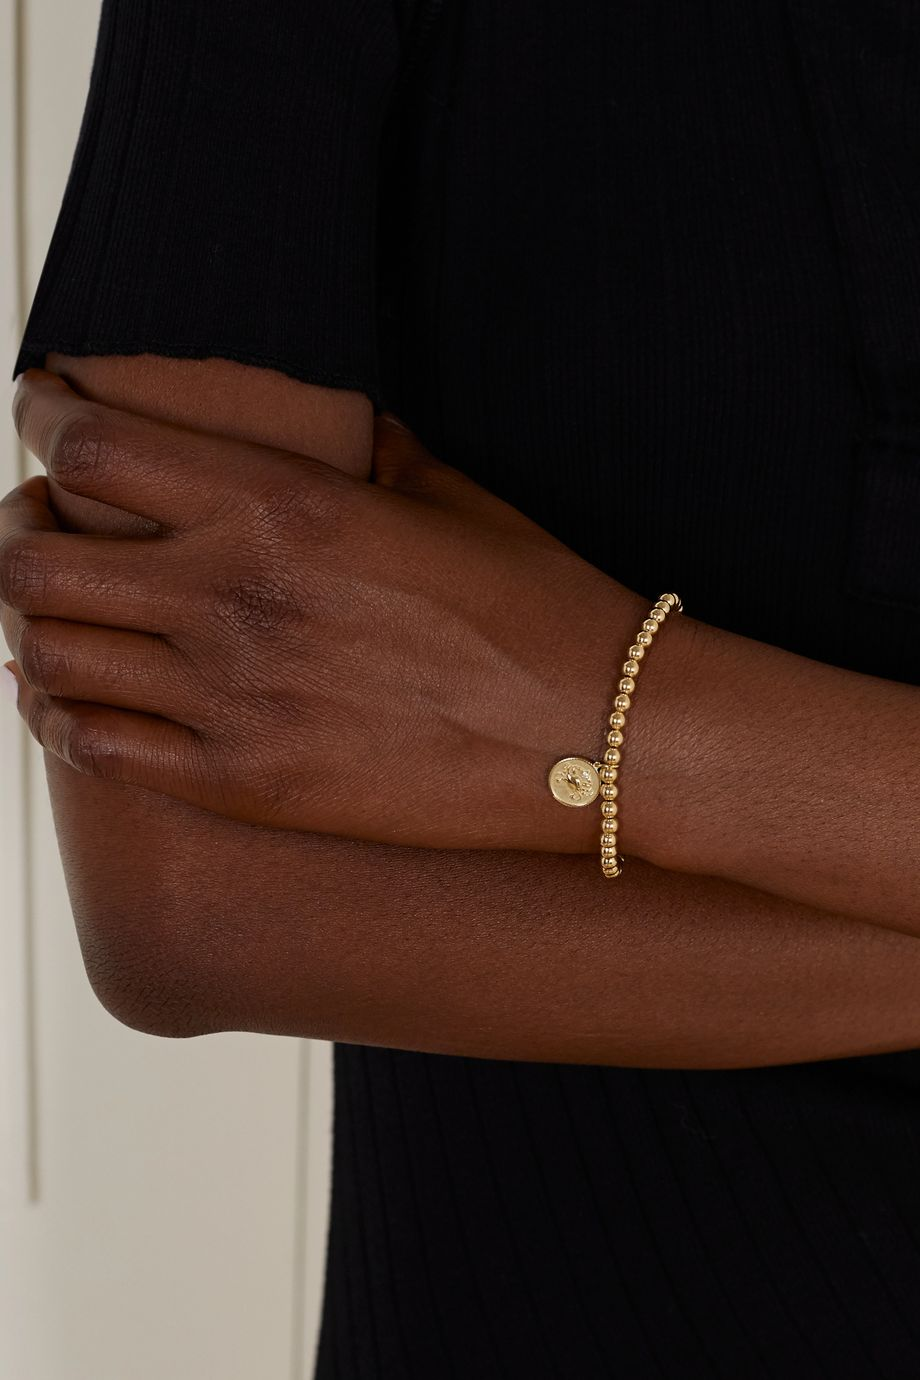 Sydney Evan Cancer 14-karat gold diamond bracelet